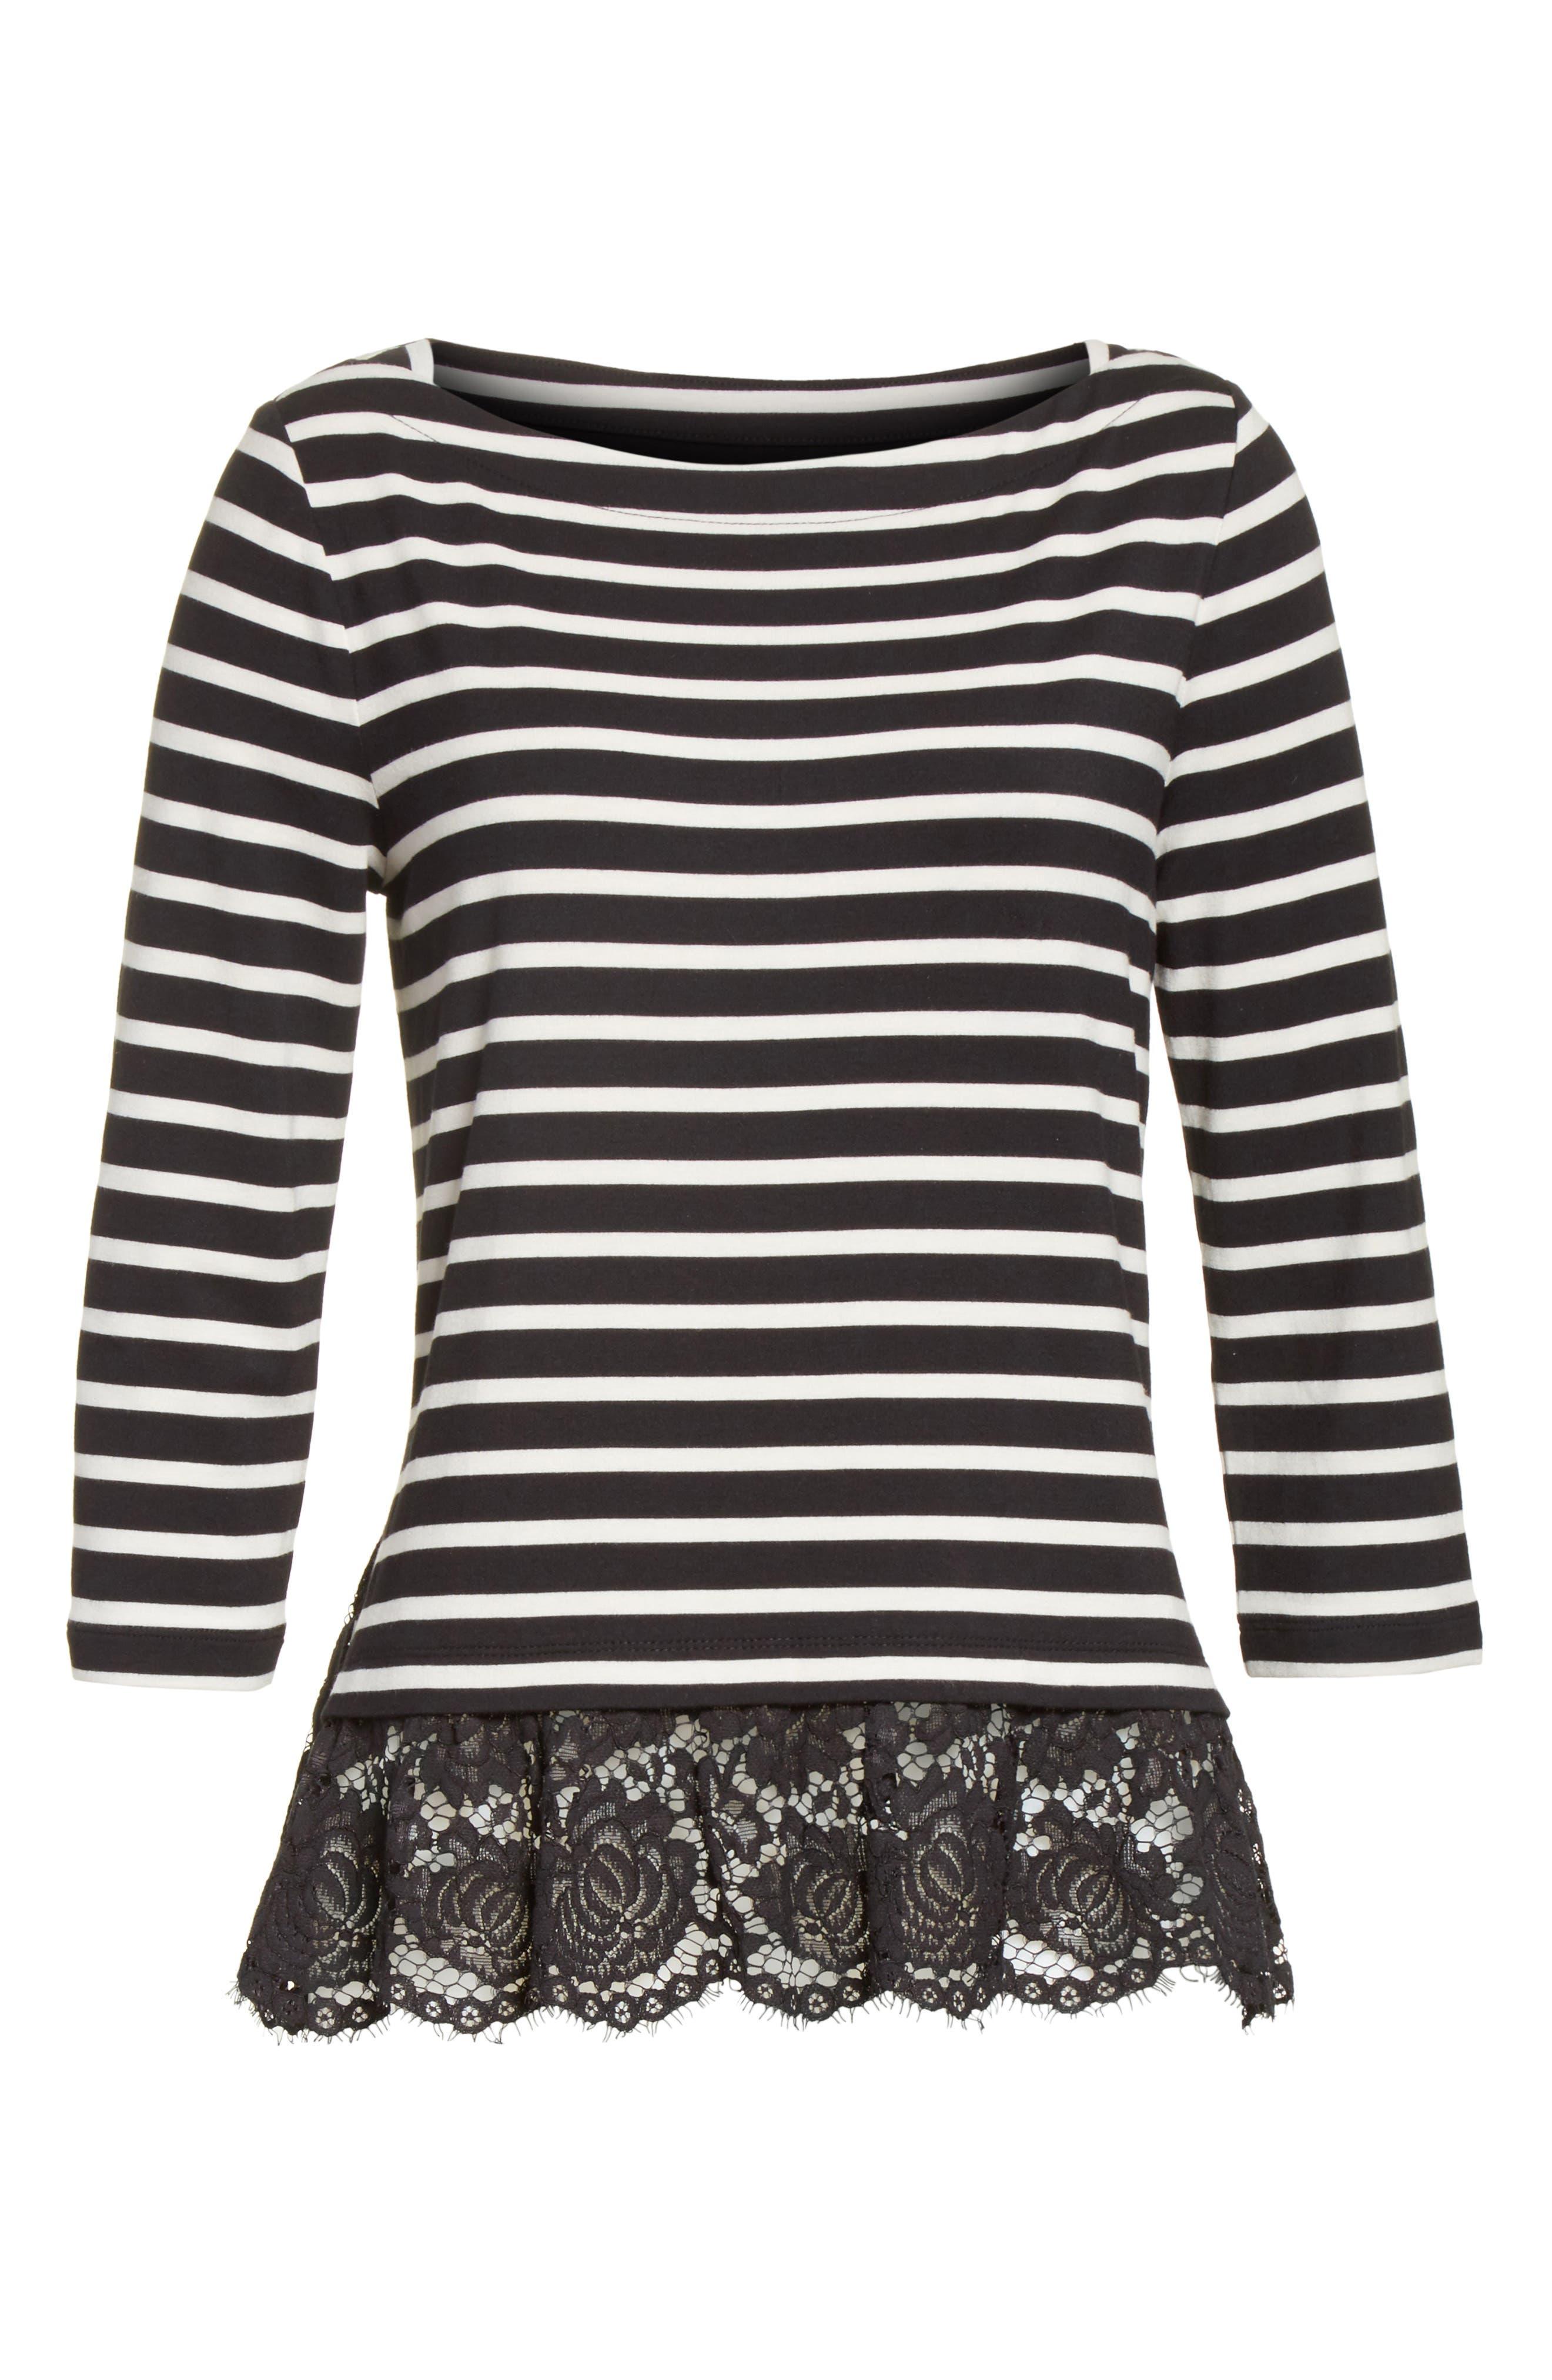 kate spade lace flounce stripe top,                             Alternate thumbnail 6, color,                             Black/ Off-White